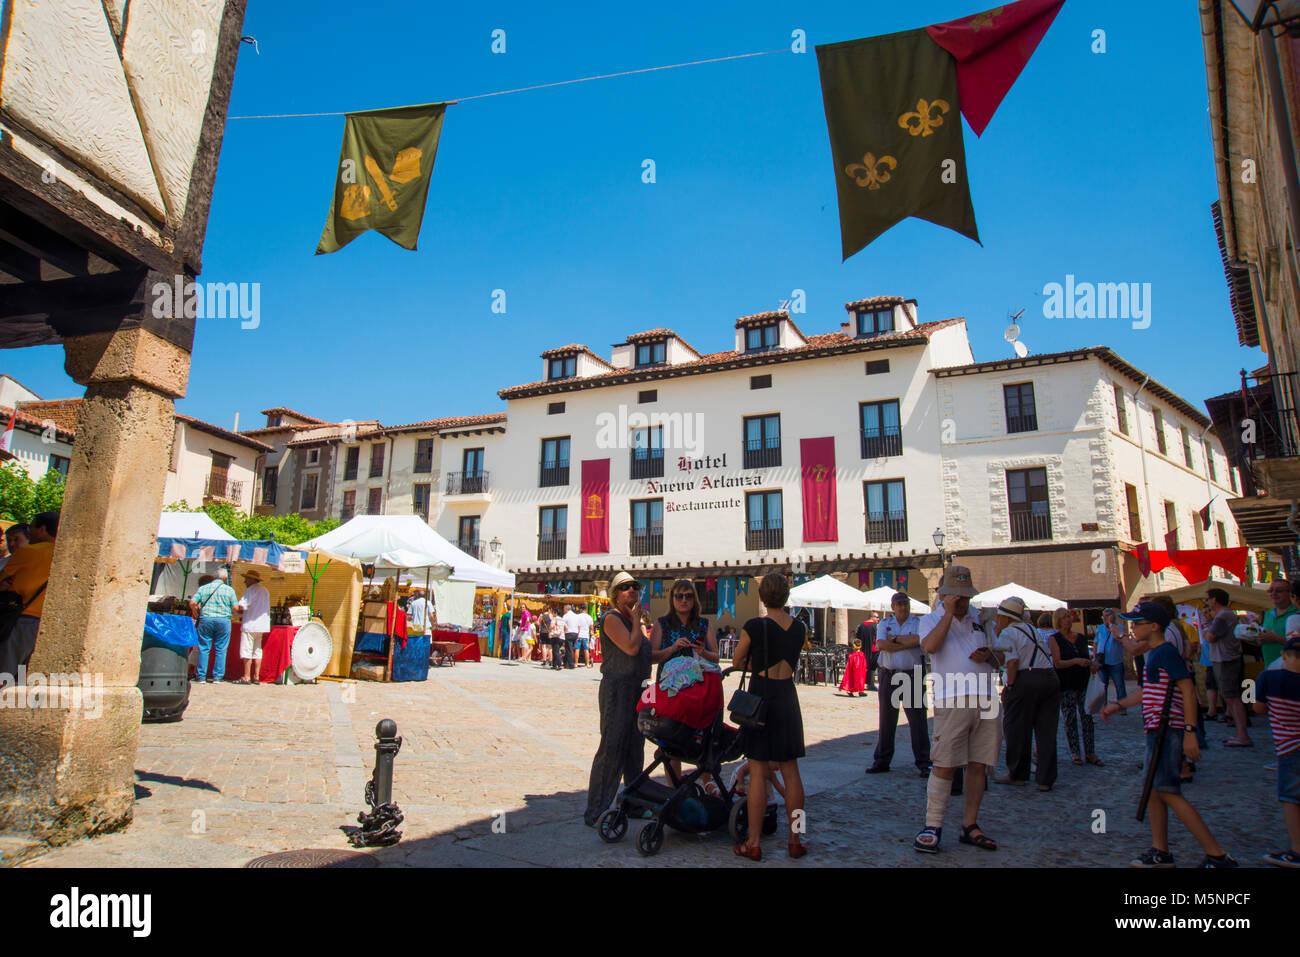 Medieval flea market. Doña Urraca Square, Covarrubias, Burgos province, Spain. - Stock Image